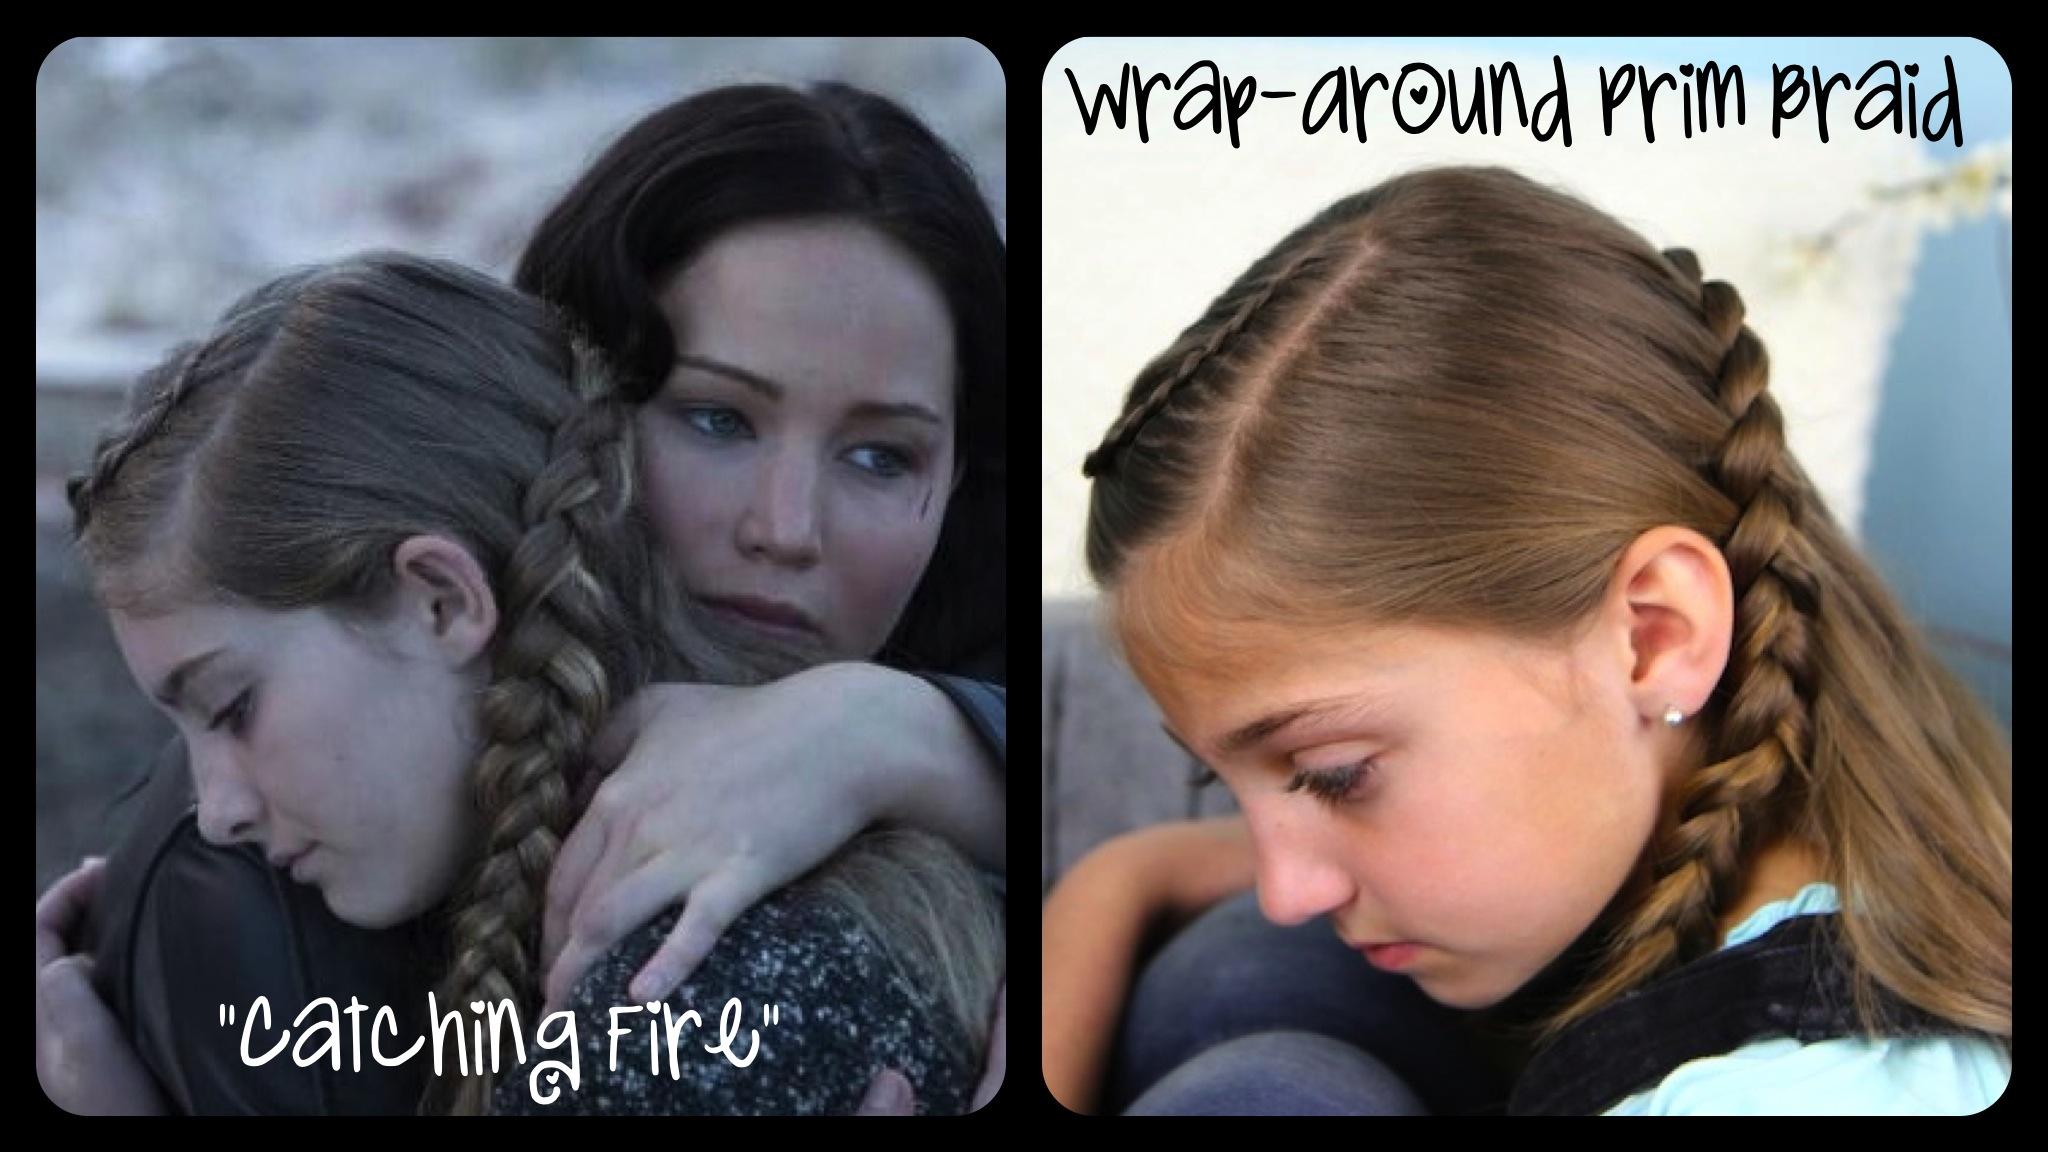 Wrap Around Prim Braid Catching Fire Hunger Games Hairstyles Cute Girls Hairstyles